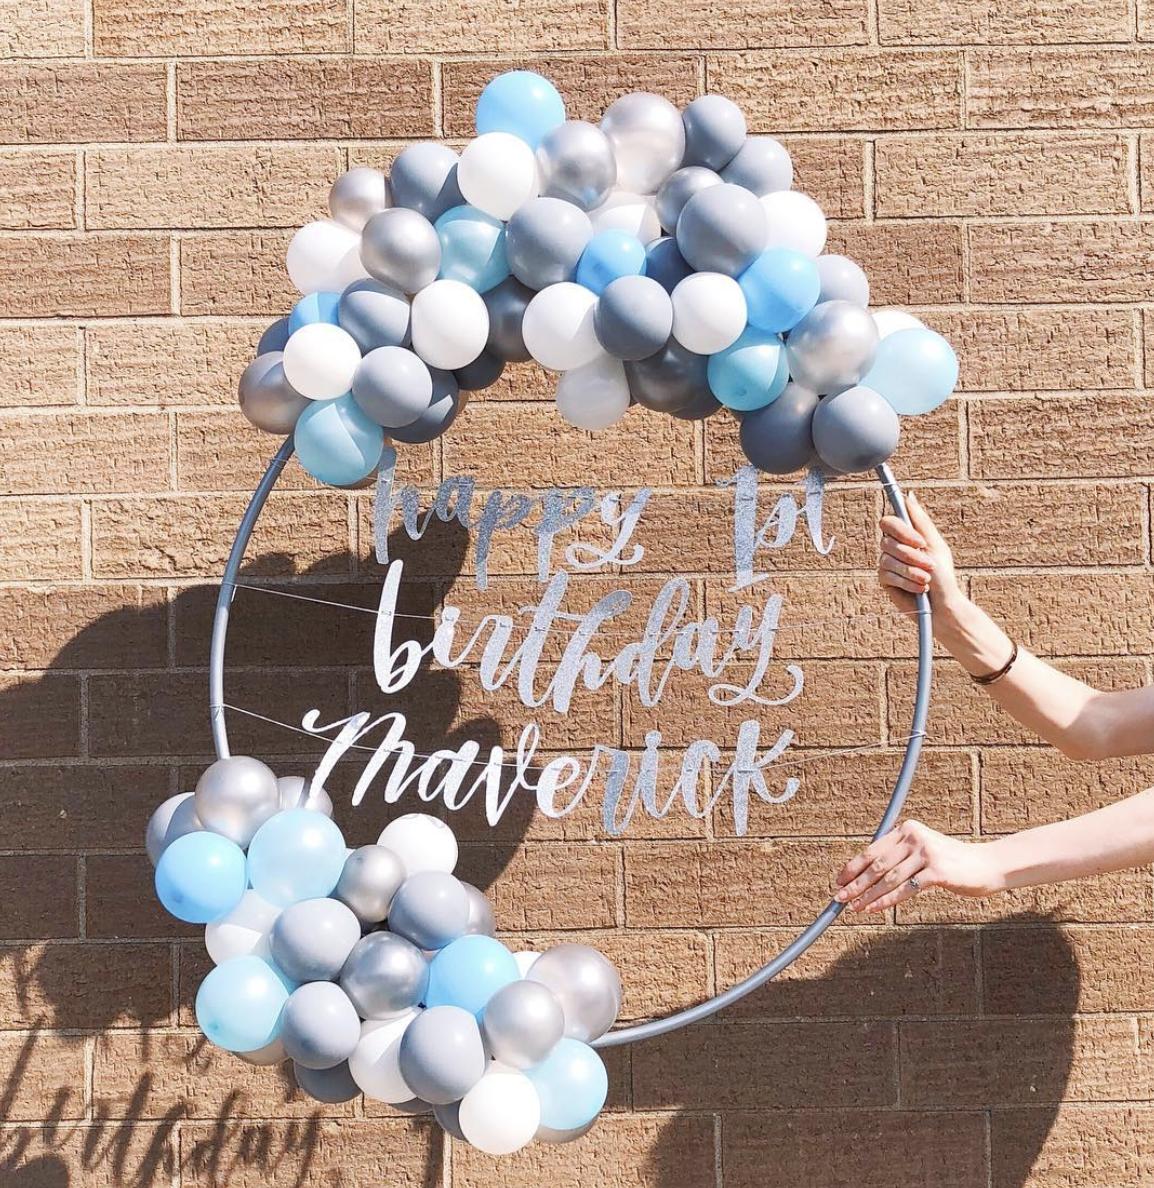 vroom_vroom_balloon_wreath_1st_birthday_maverick.png